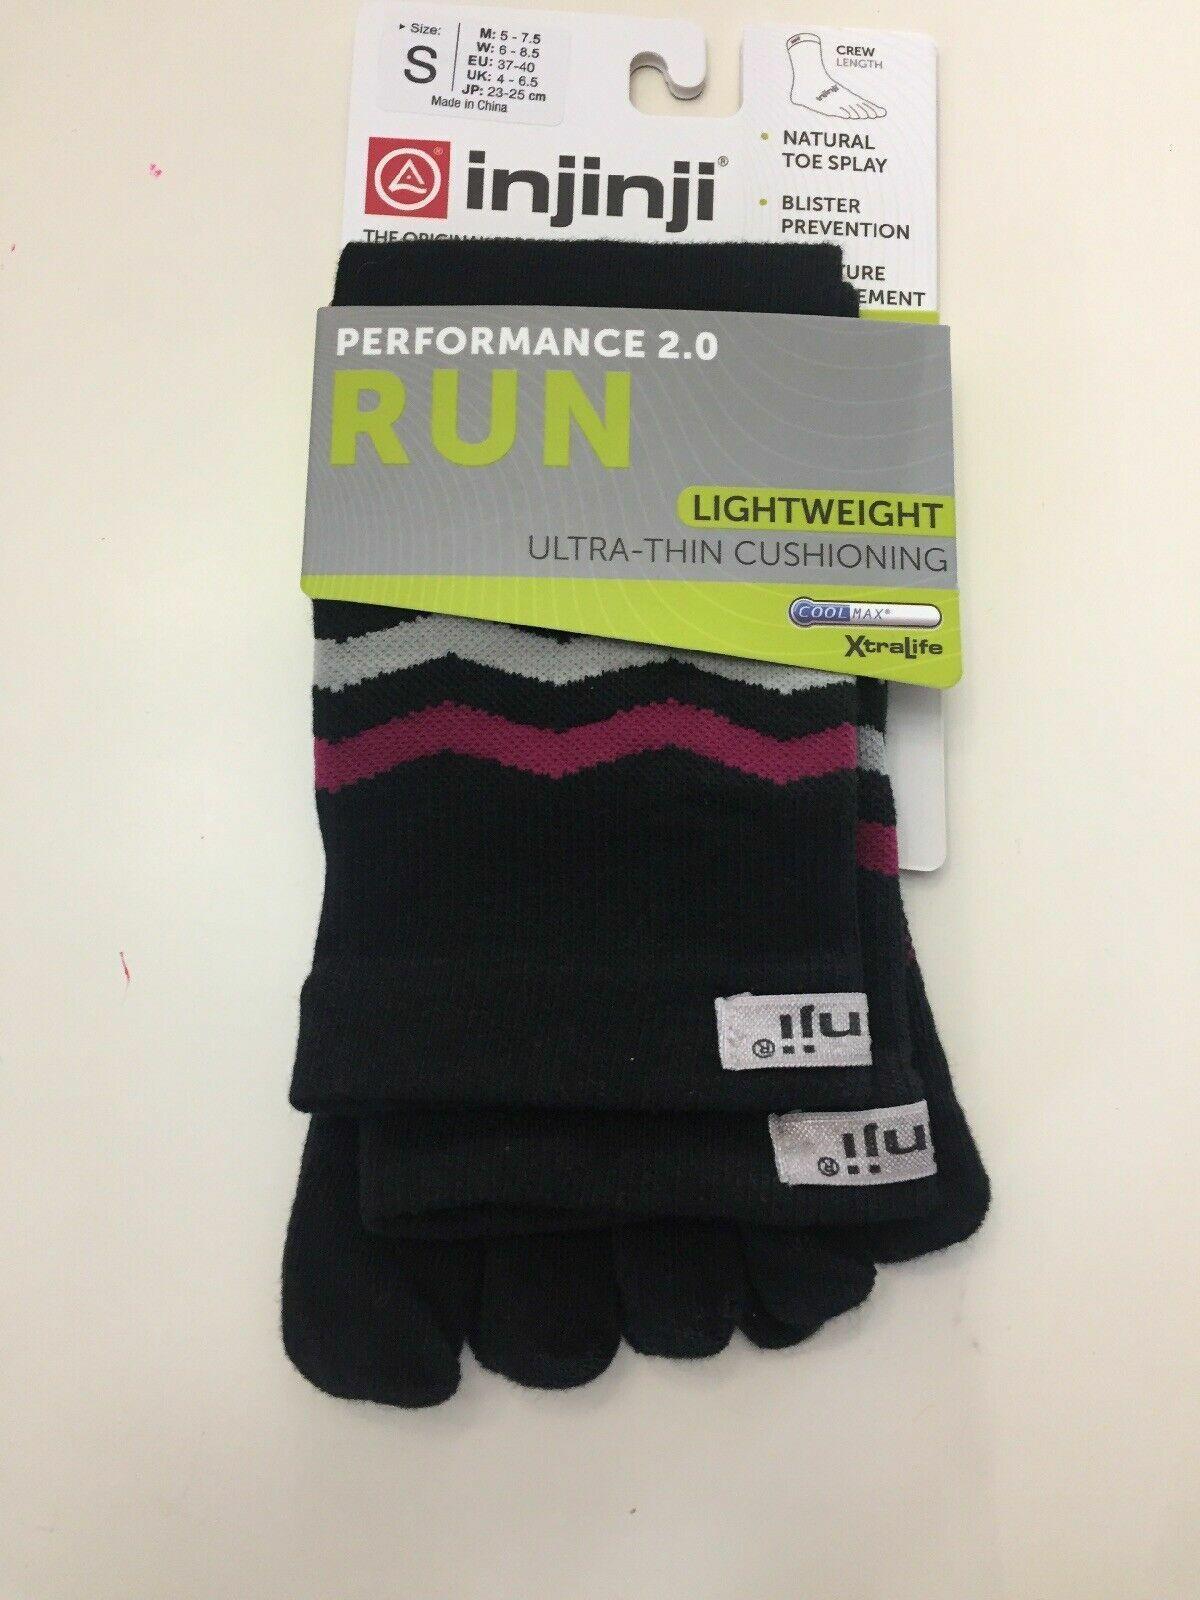 Injinji Run Toe Crew Socks Performance 2.0 Lightweight Weigh